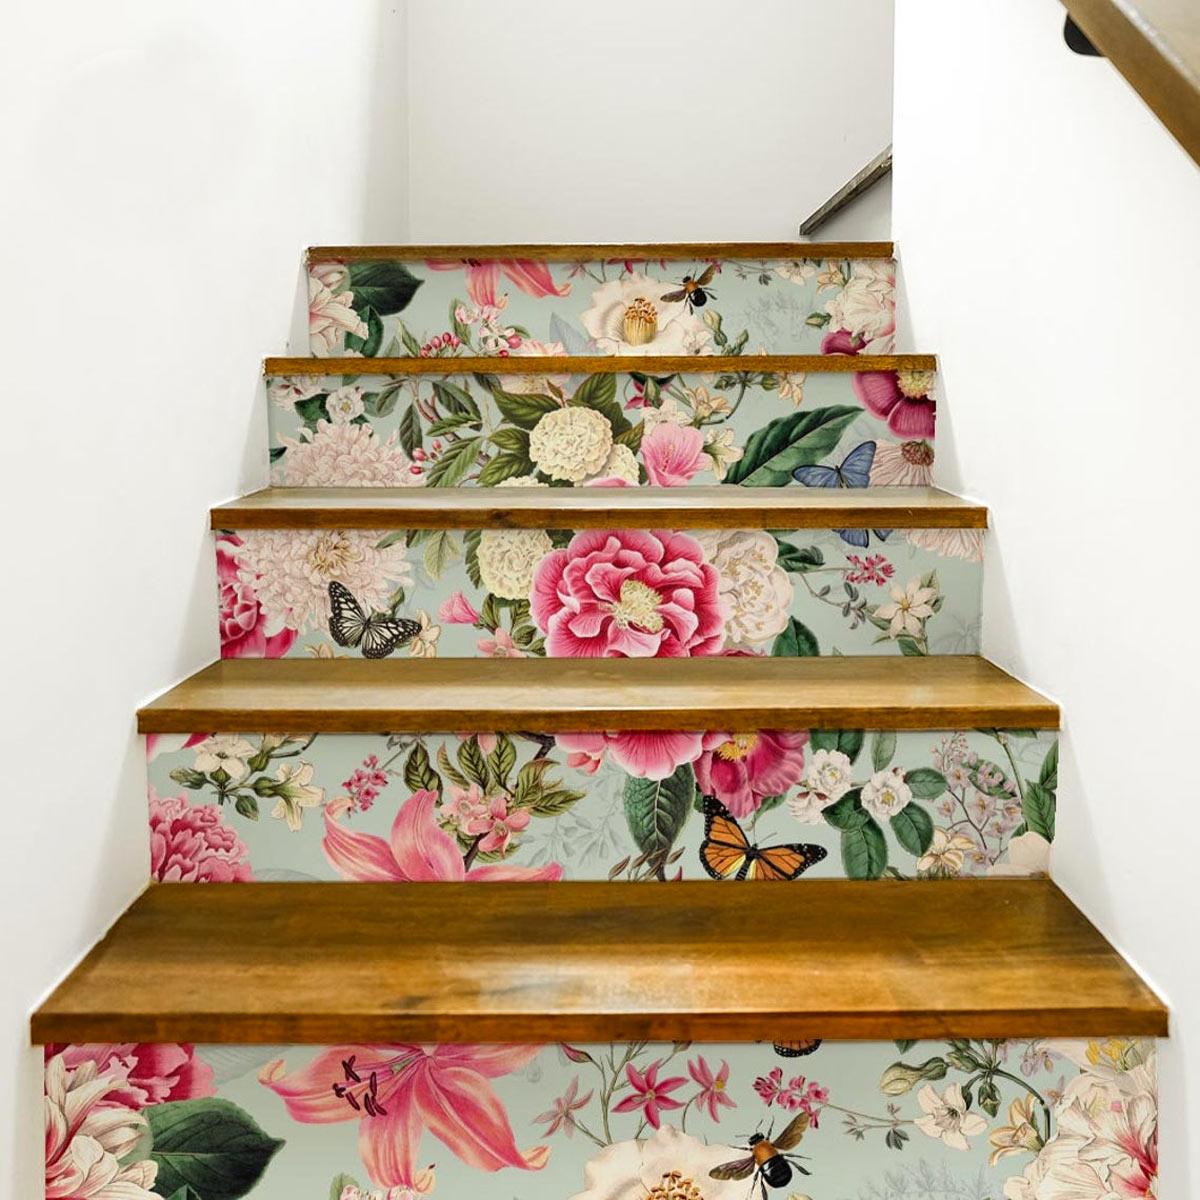 Adesivi decorativi per scale di casa.